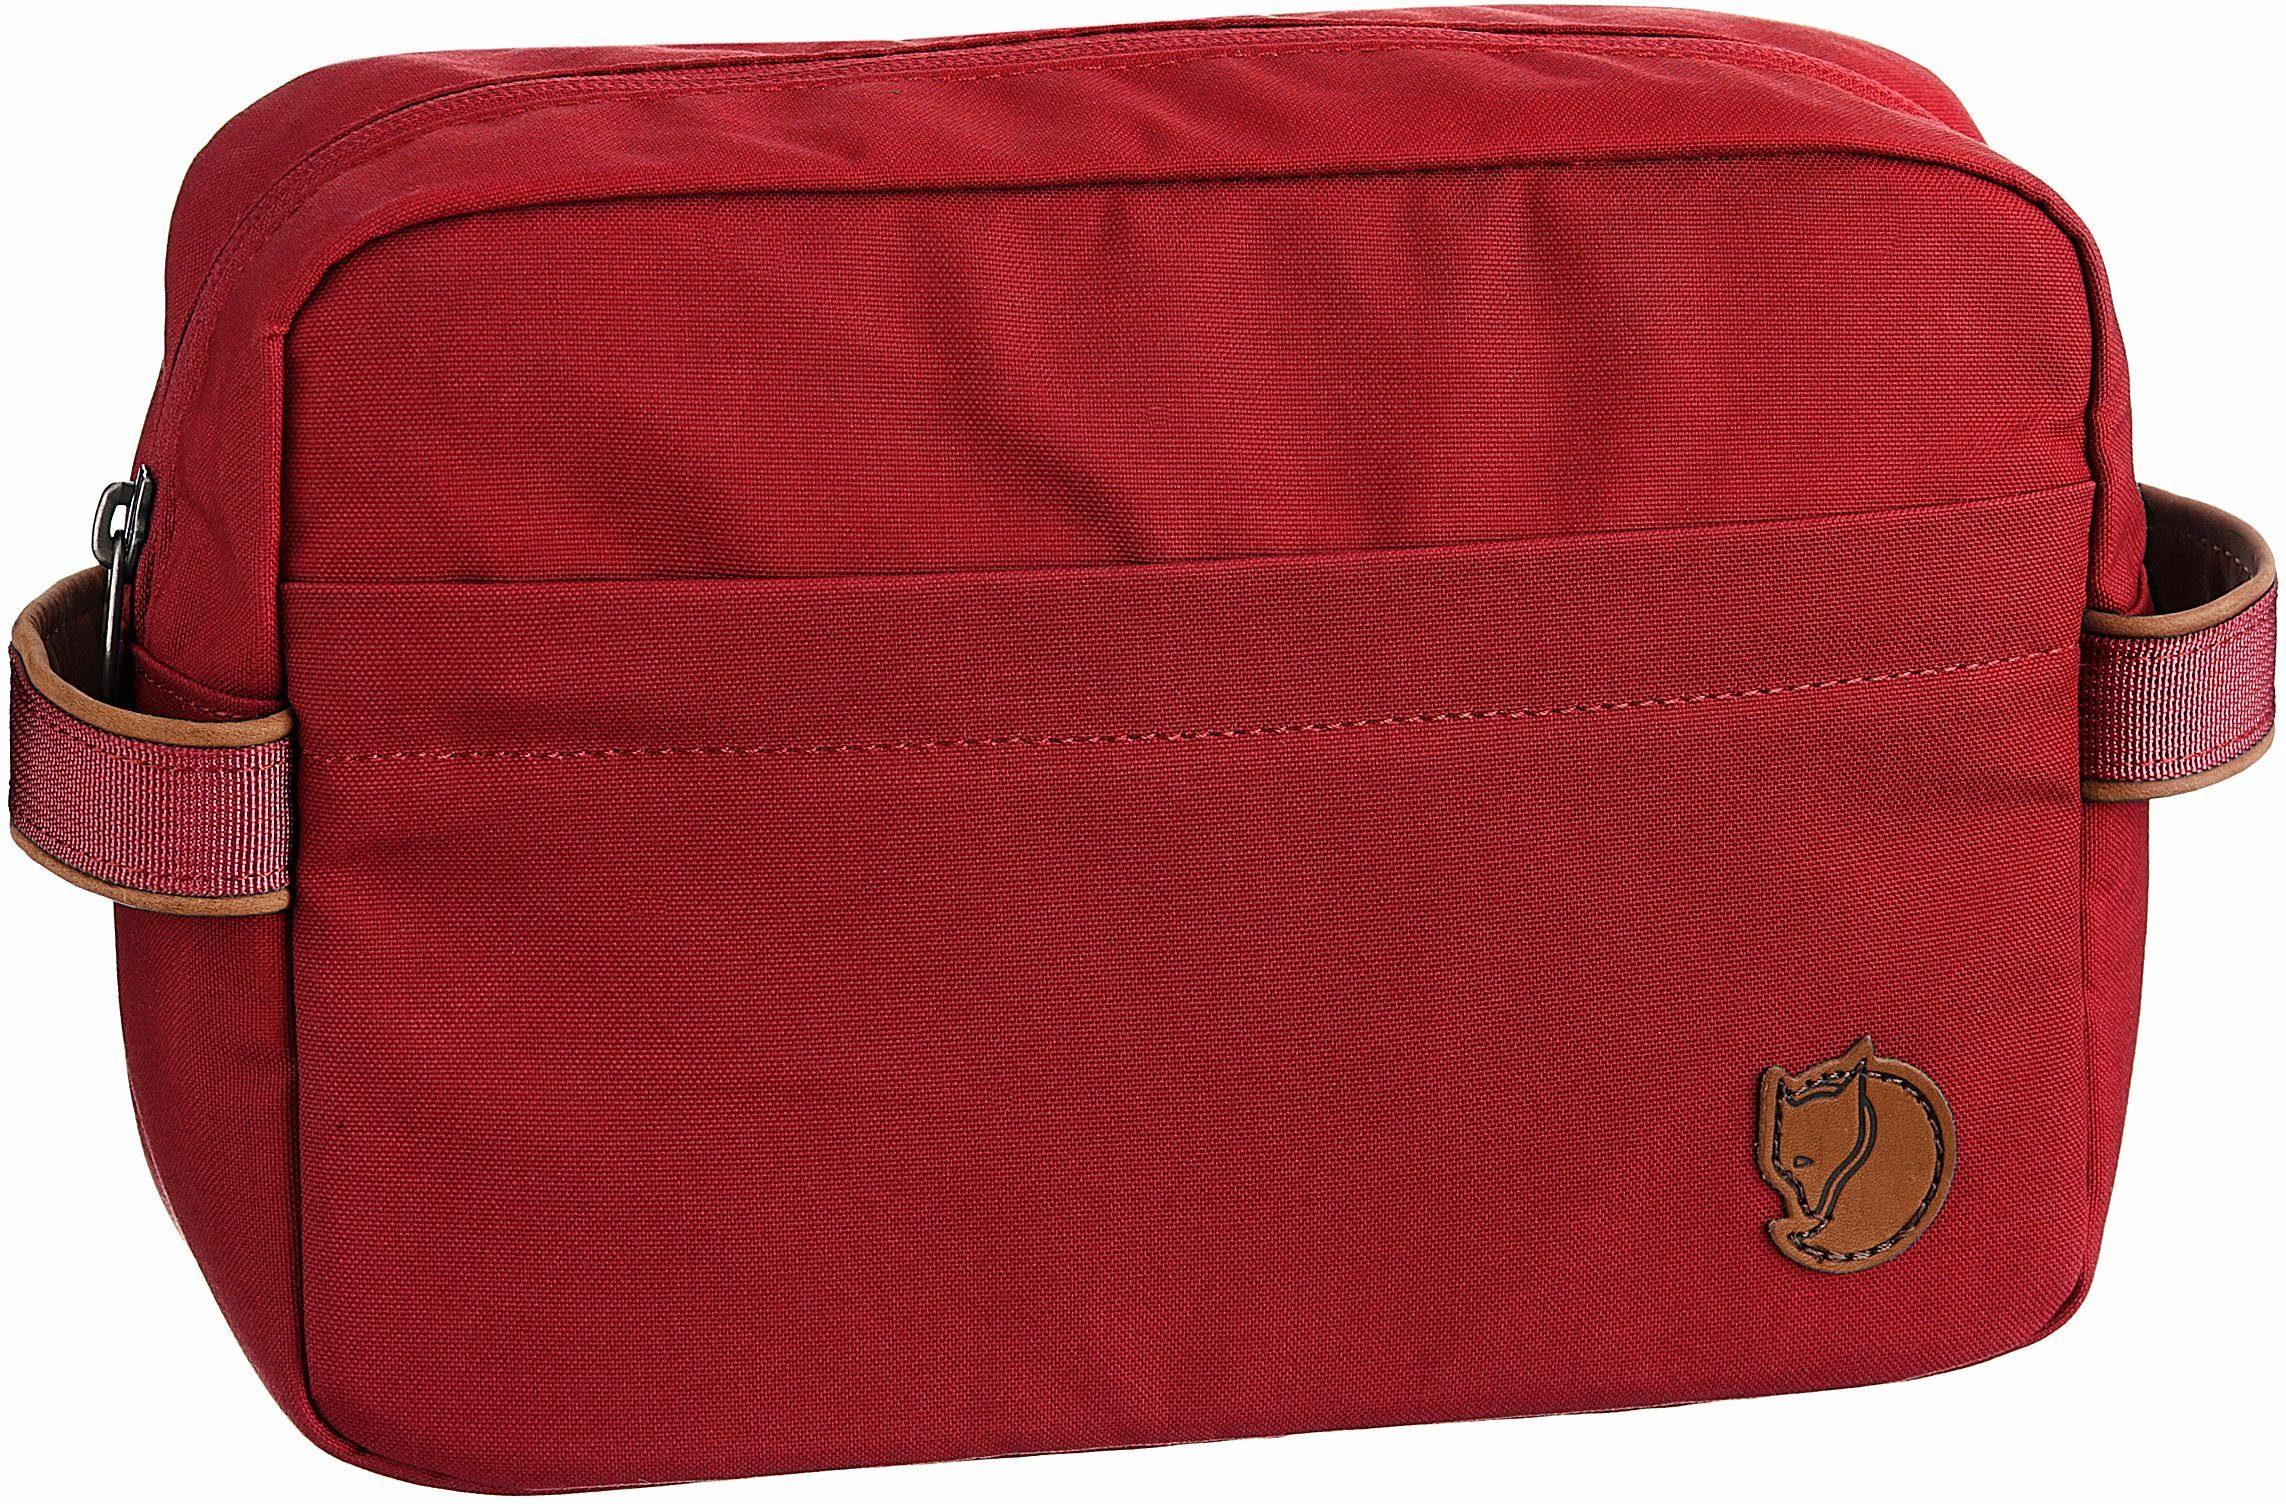 Travelite Travel Kit Cosmetic Bag L Kulturbeutel Tasche Schwarz Reisen Reiseaccessoires